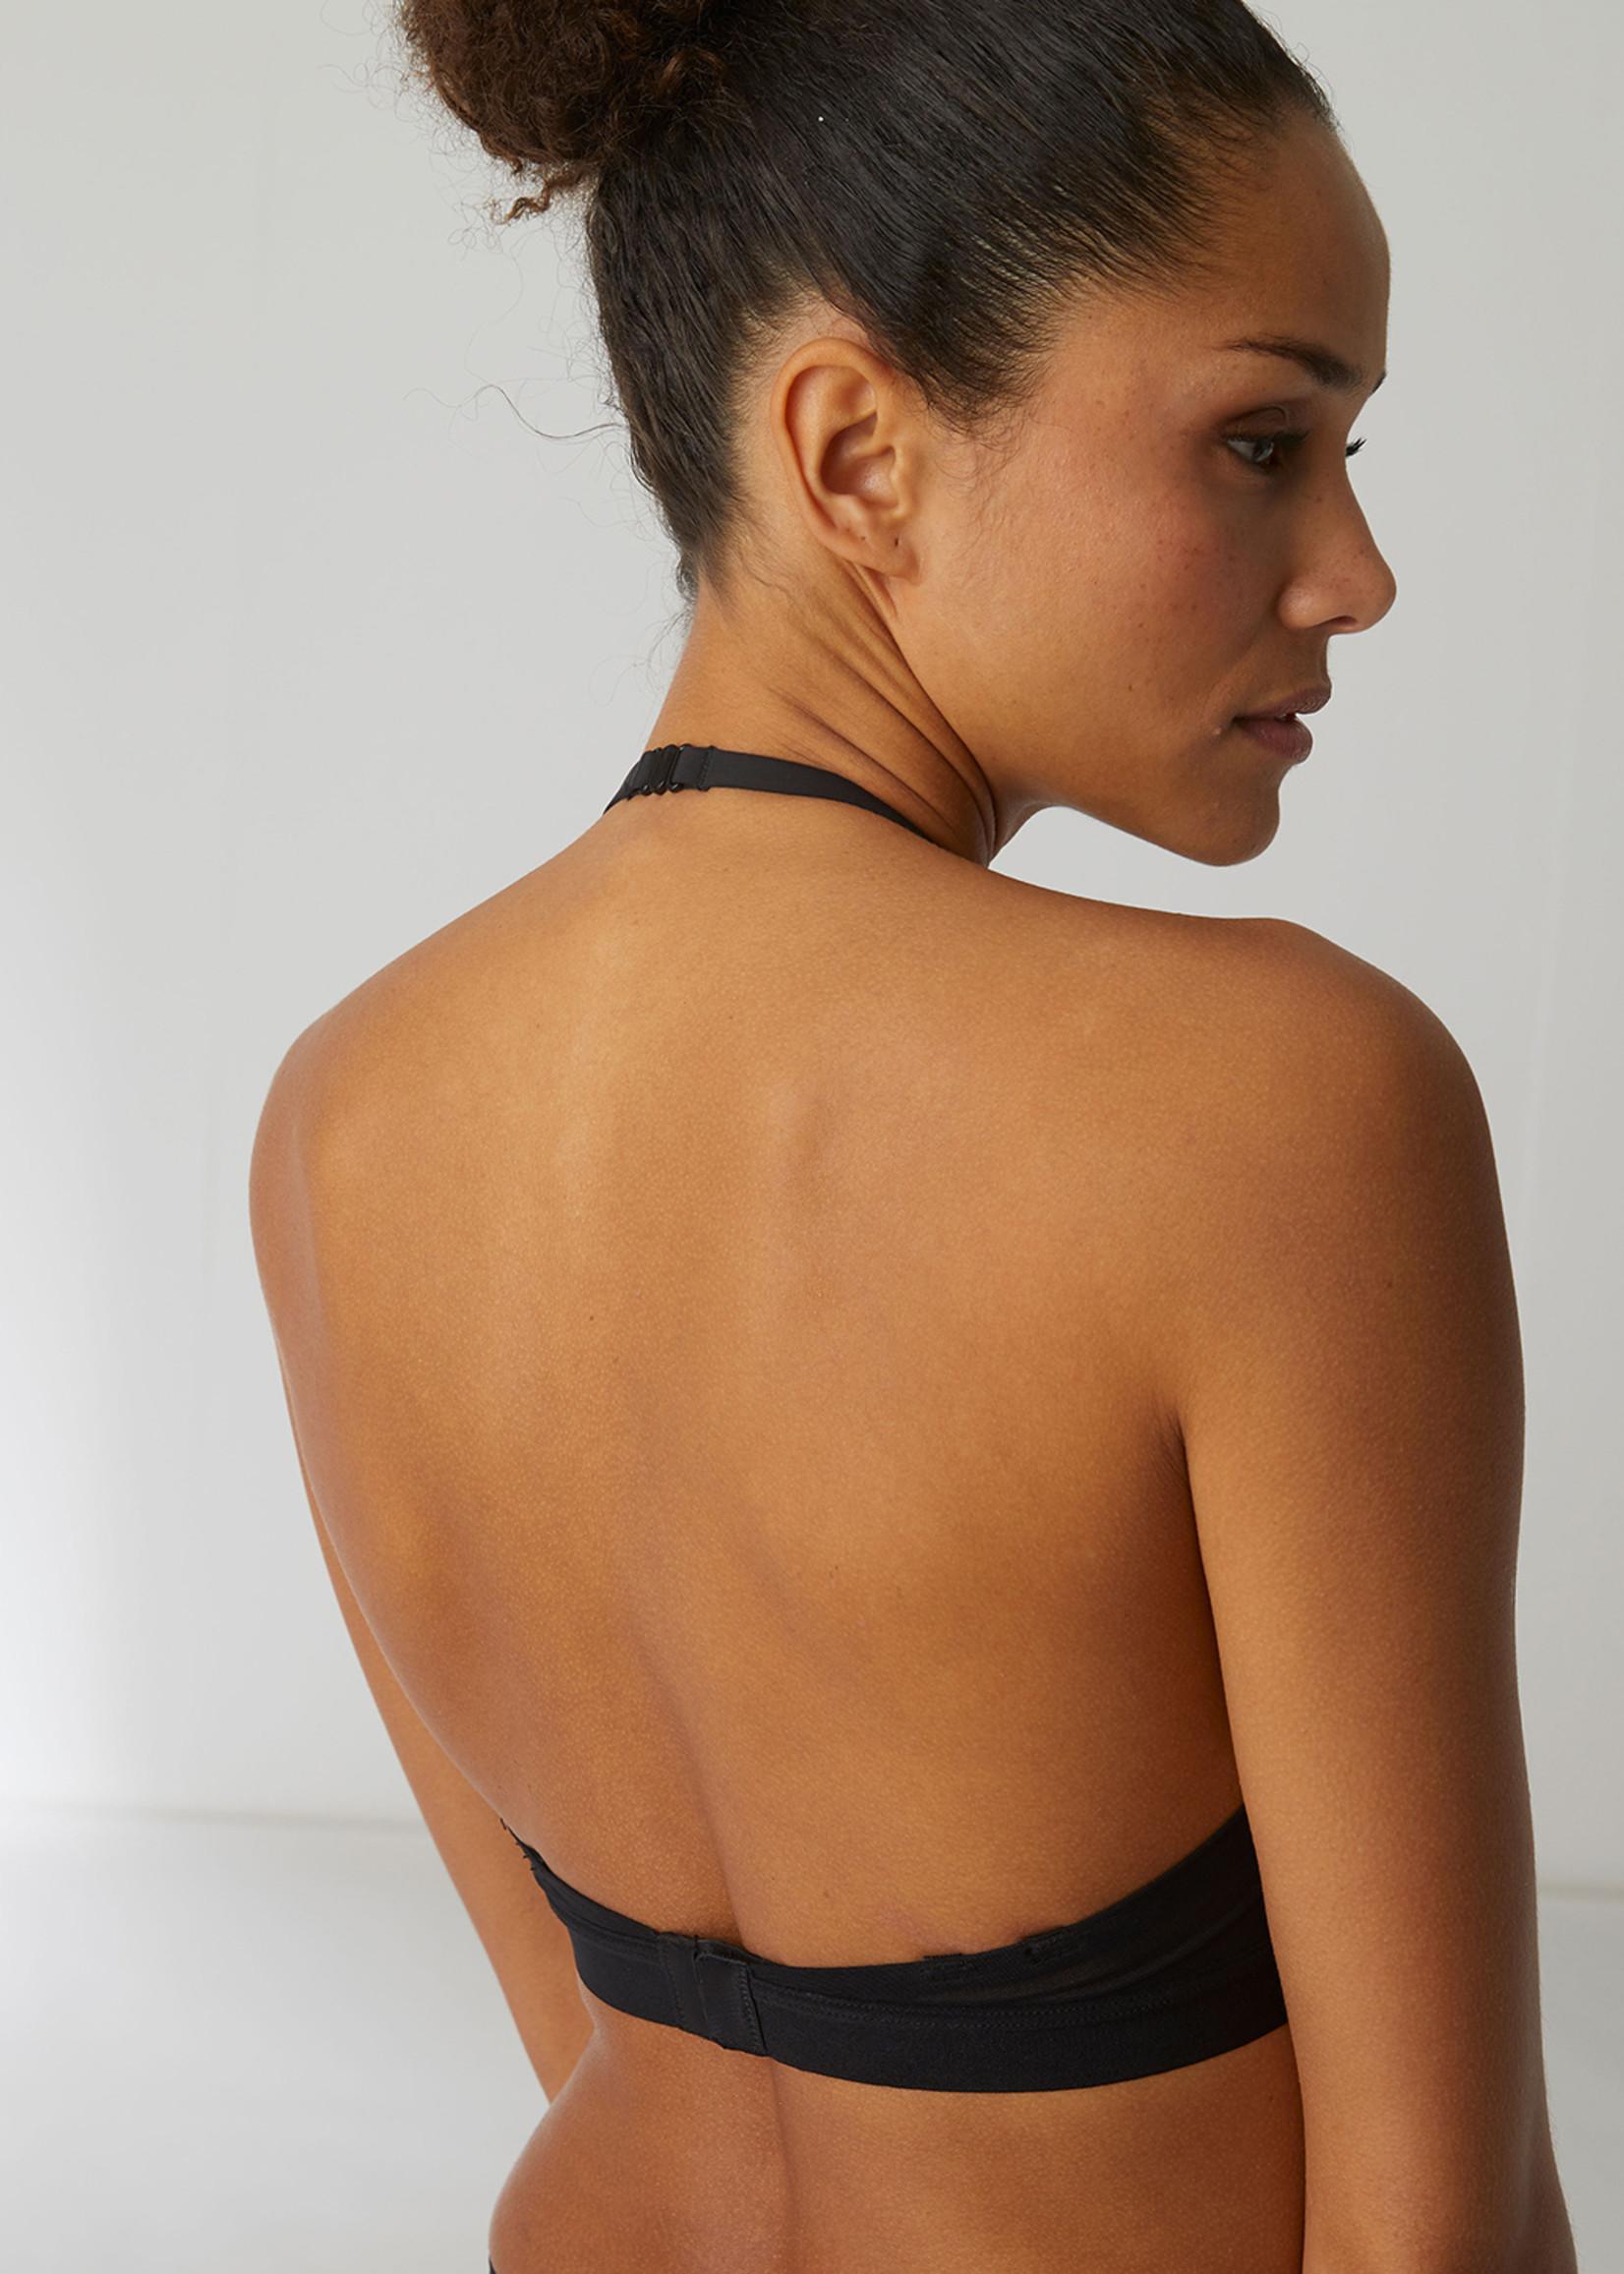 Simone Perele Essential Bralette